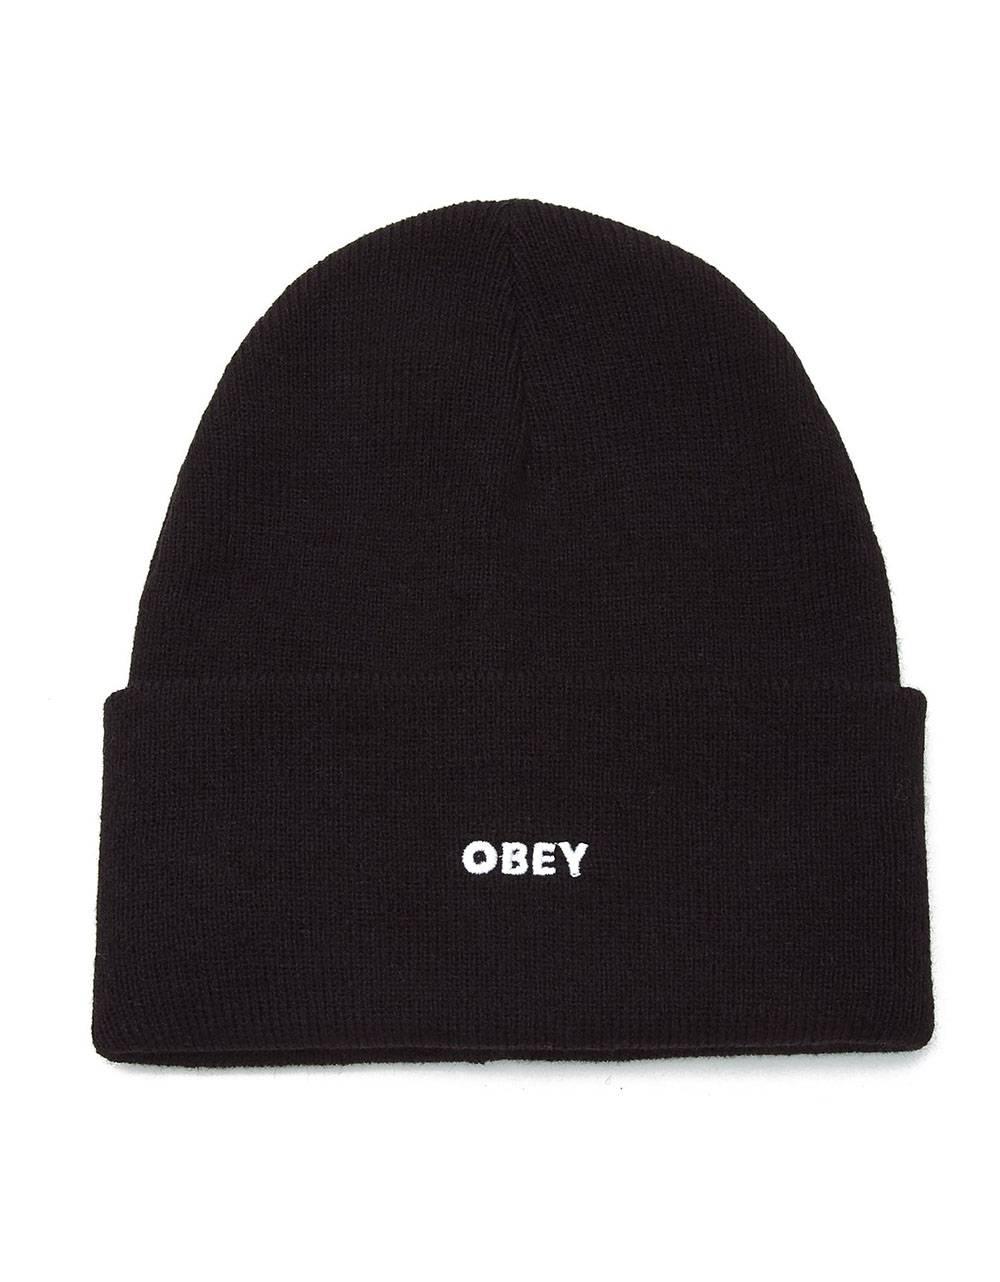 Obey fluid beanie - black obey Beanie 28,69€